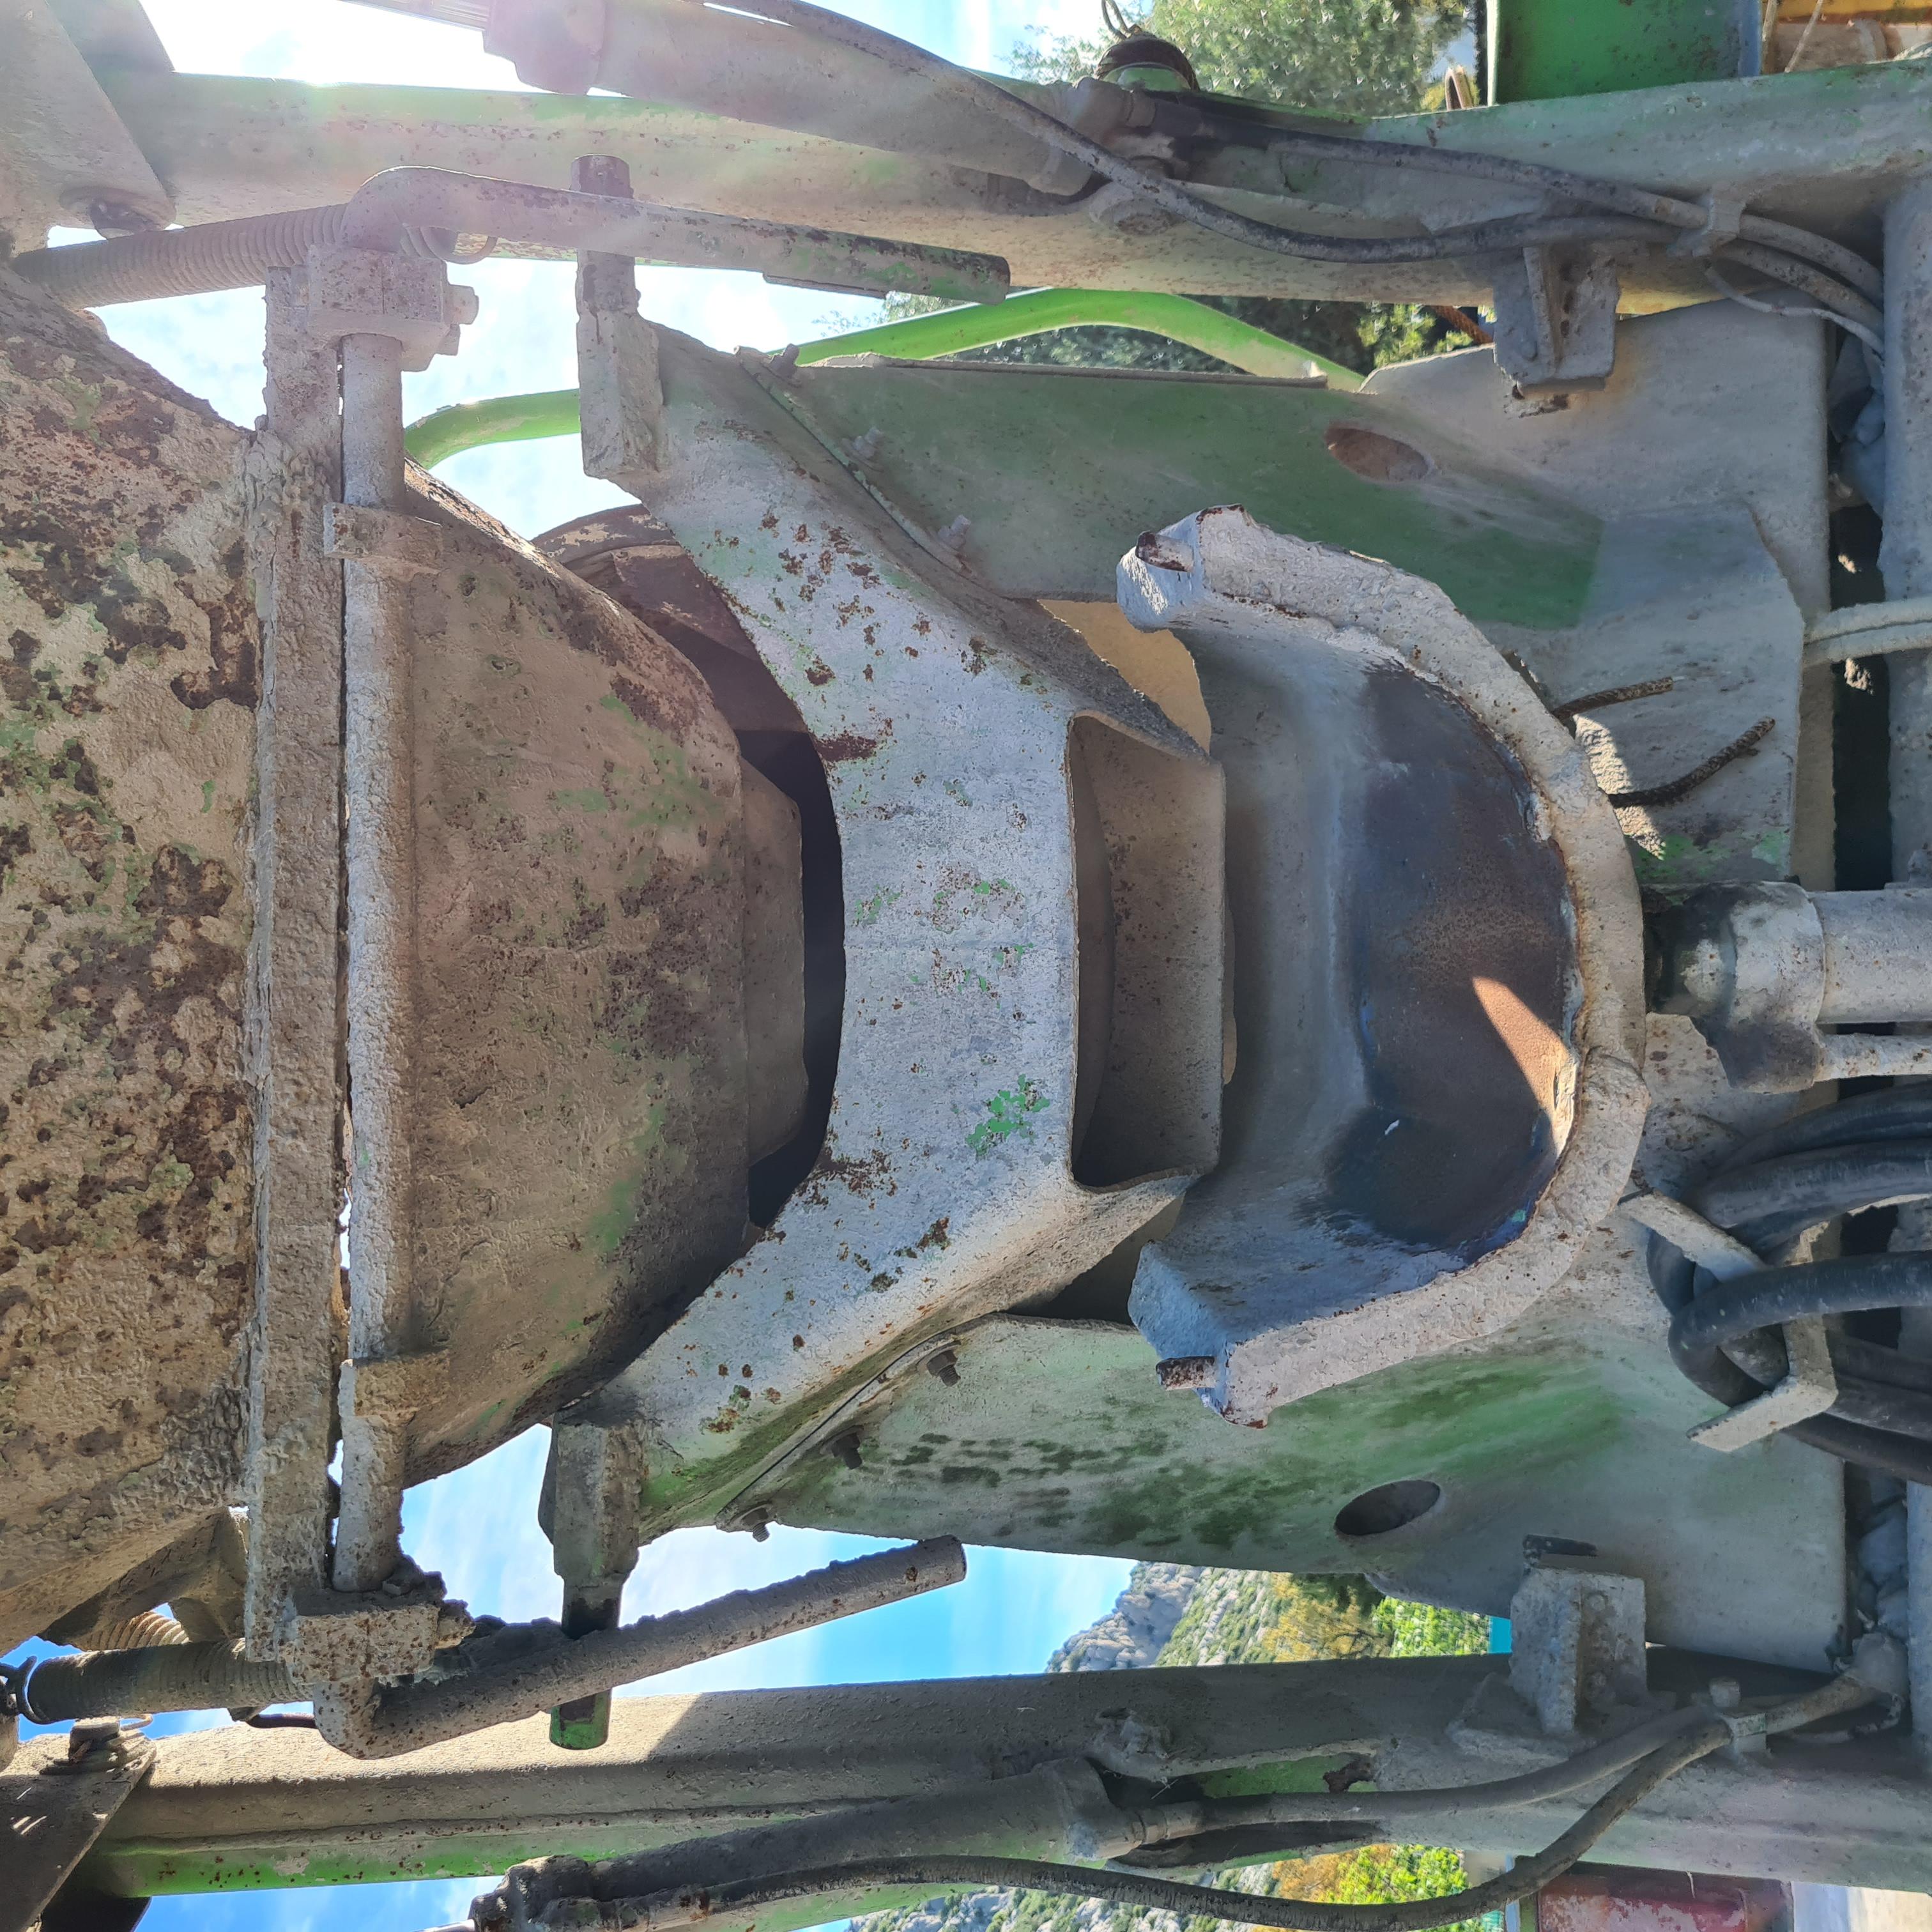 Merlo dumper betoniera dbm 2500 in vendita - foto 7